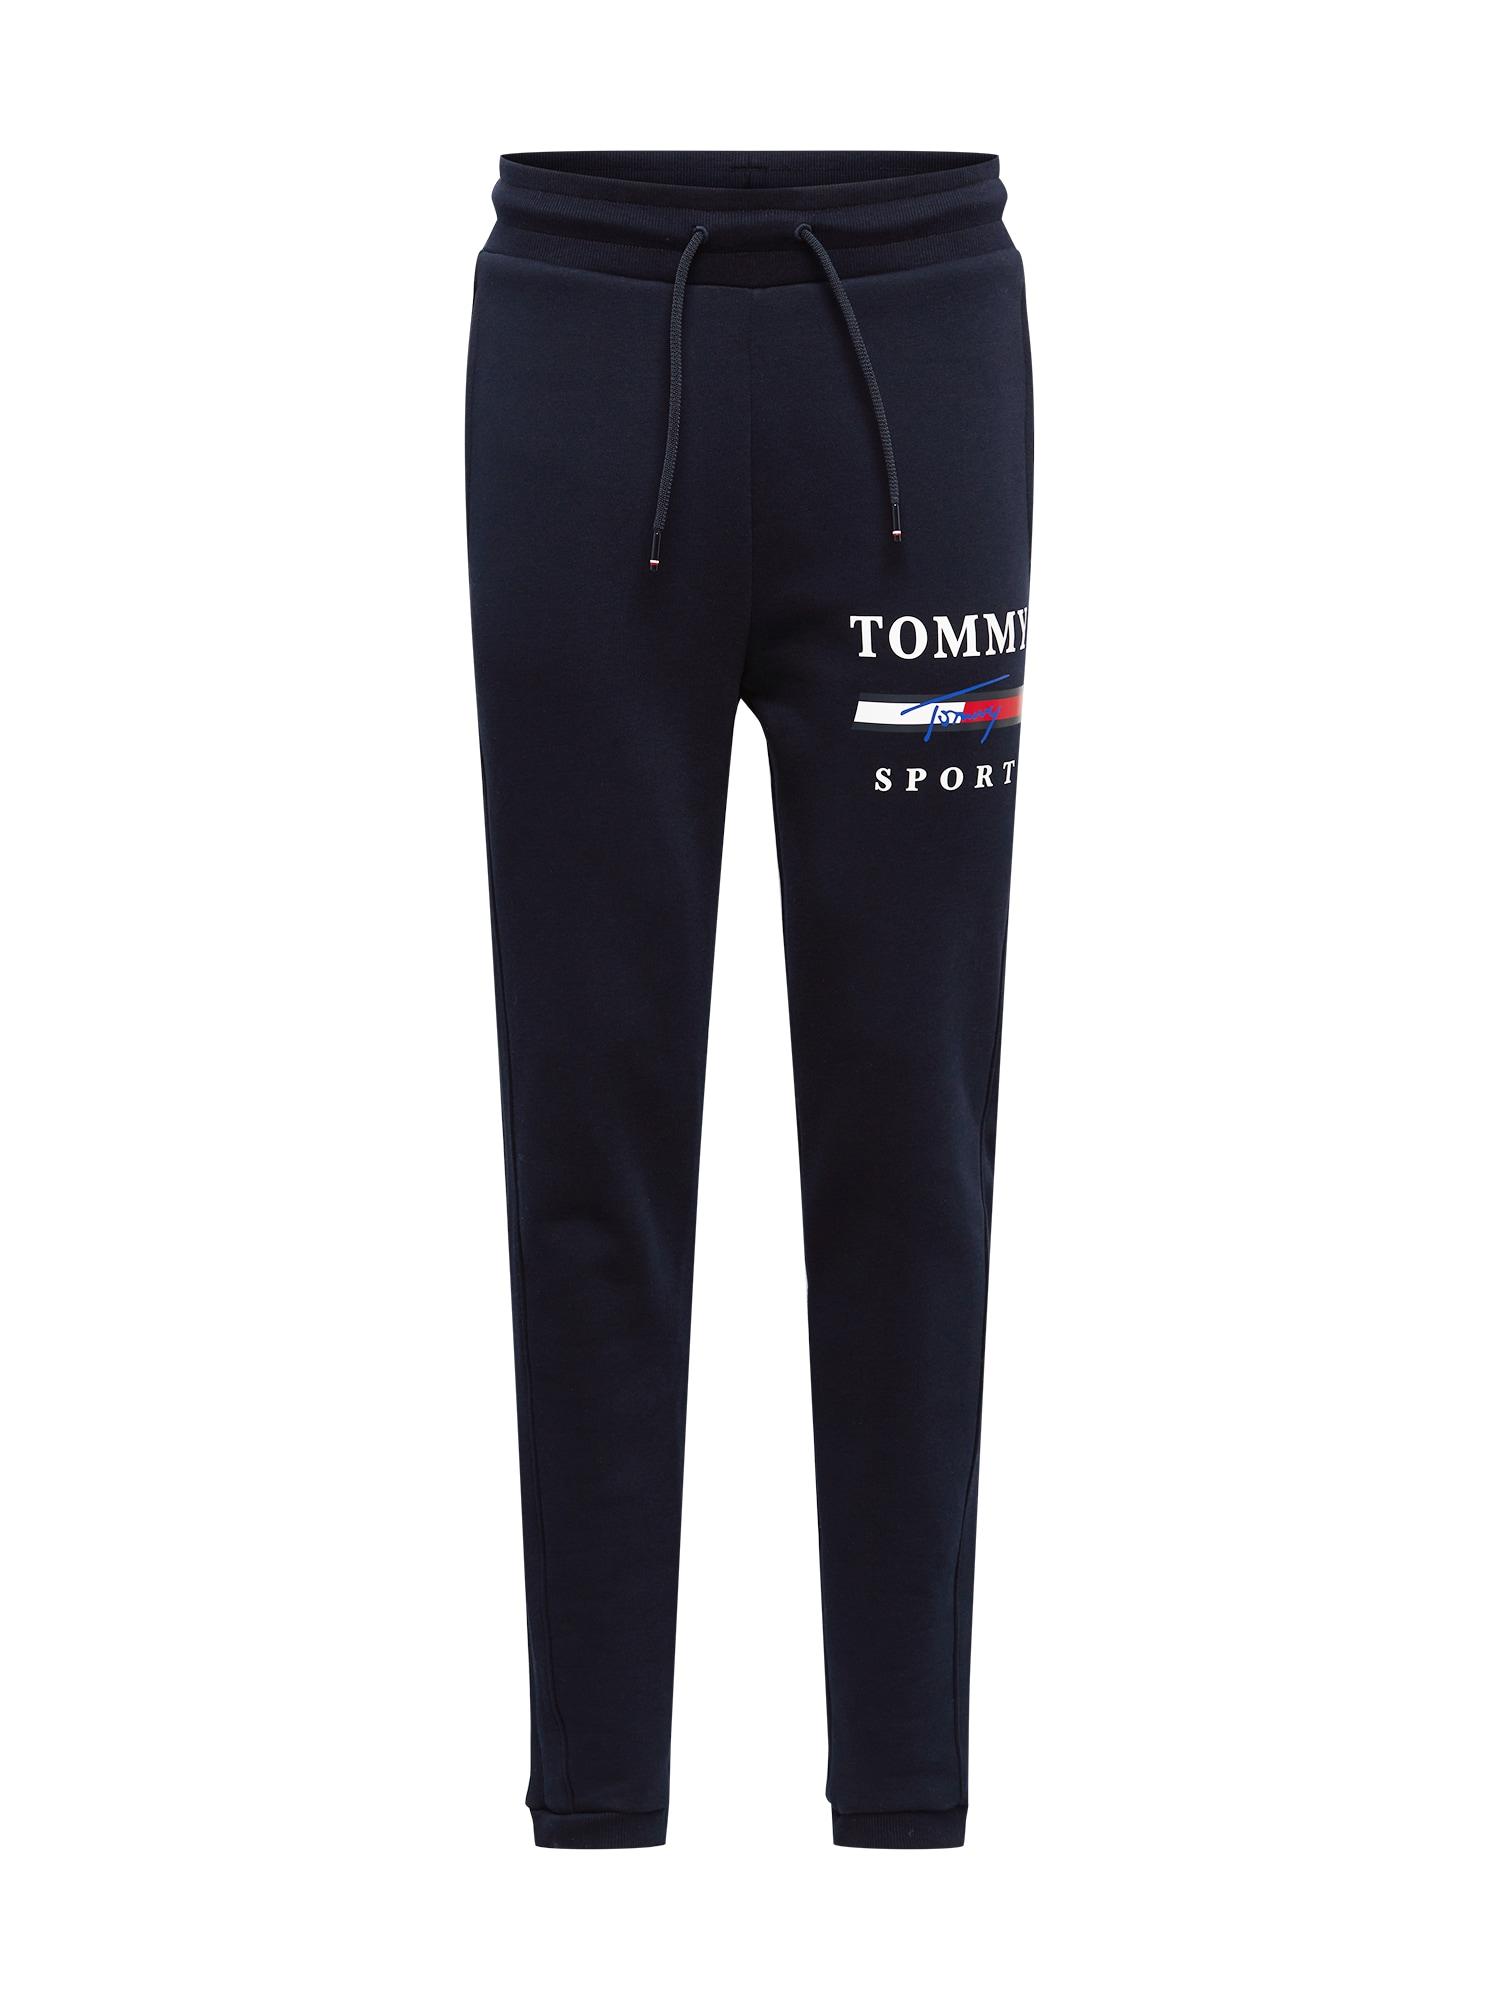 "Tommy Sport Sportinės kelnės tamsiai mėlyna / balta / raudona / sodri mėlyna (""karališka"")"